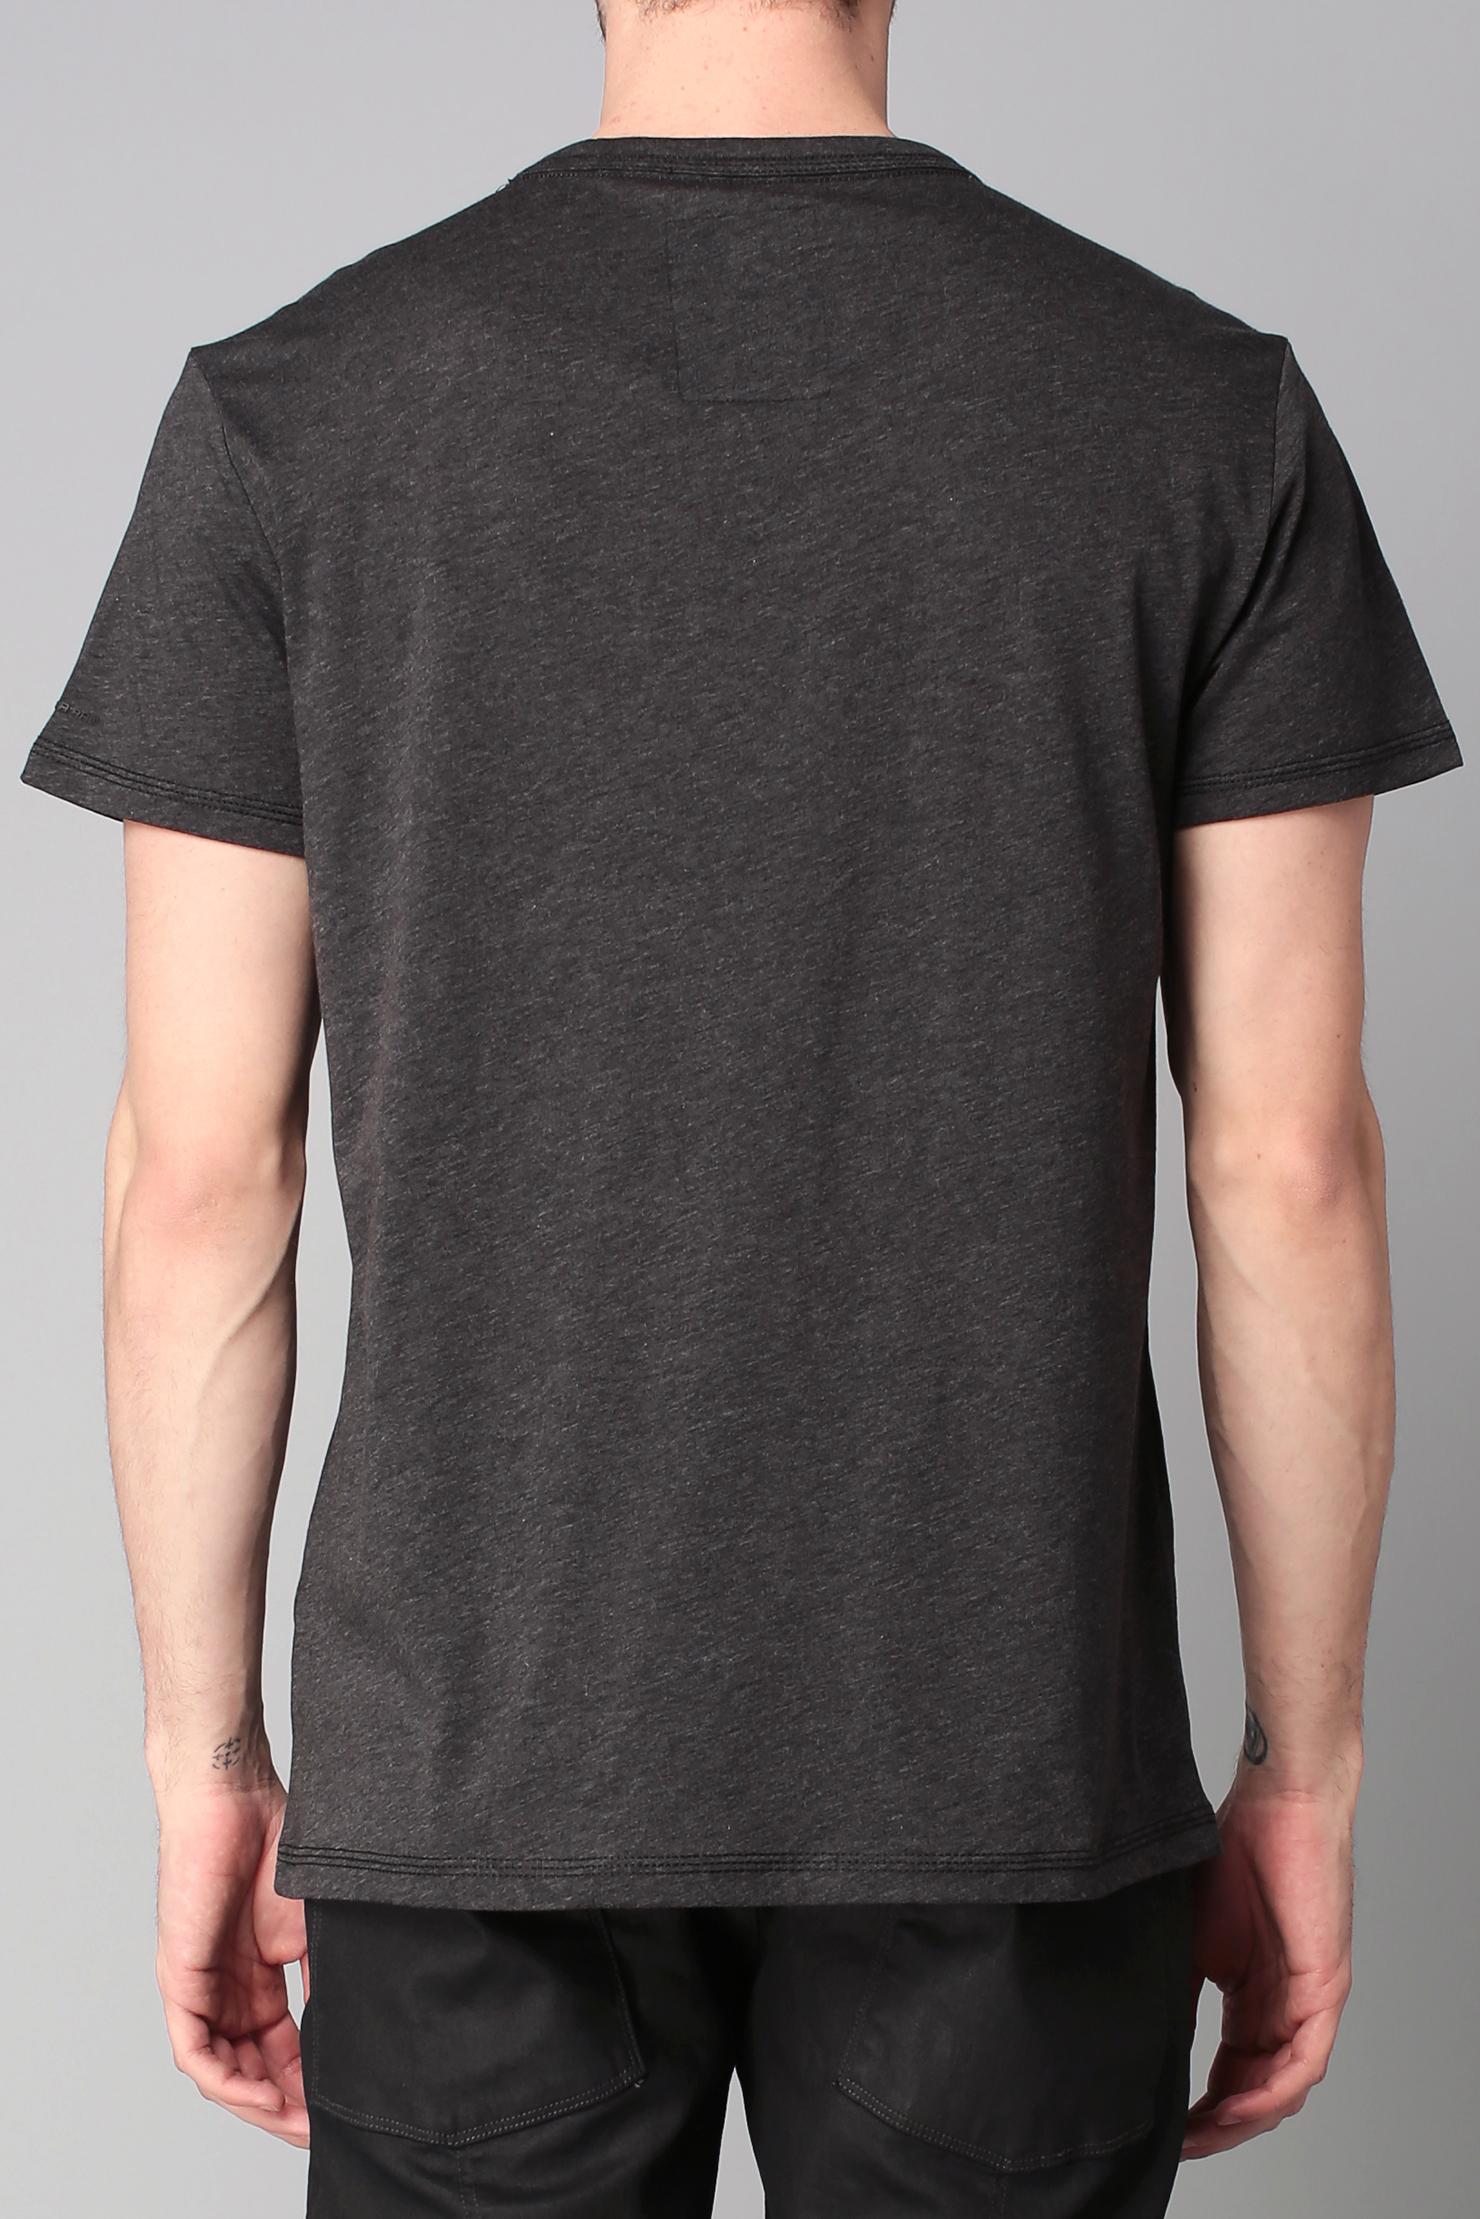 g star raw short sleeve t shirt in black for men lyst. Black Bedroom Furniture Sets. Home Design Ideas